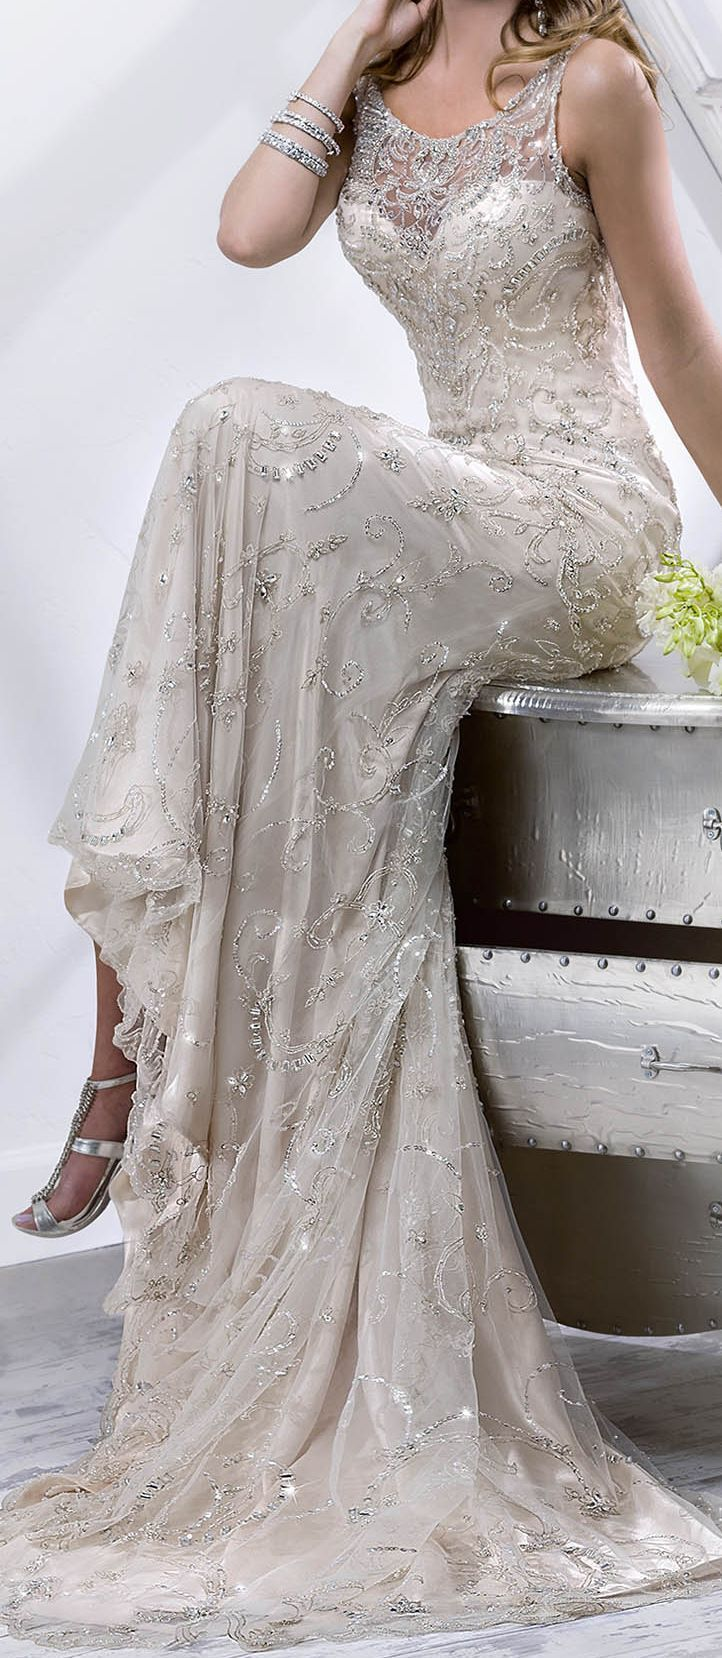 72e63c1eae2e Once Upon A Time..... | clothing | Pinterest | Wedding dresses ...